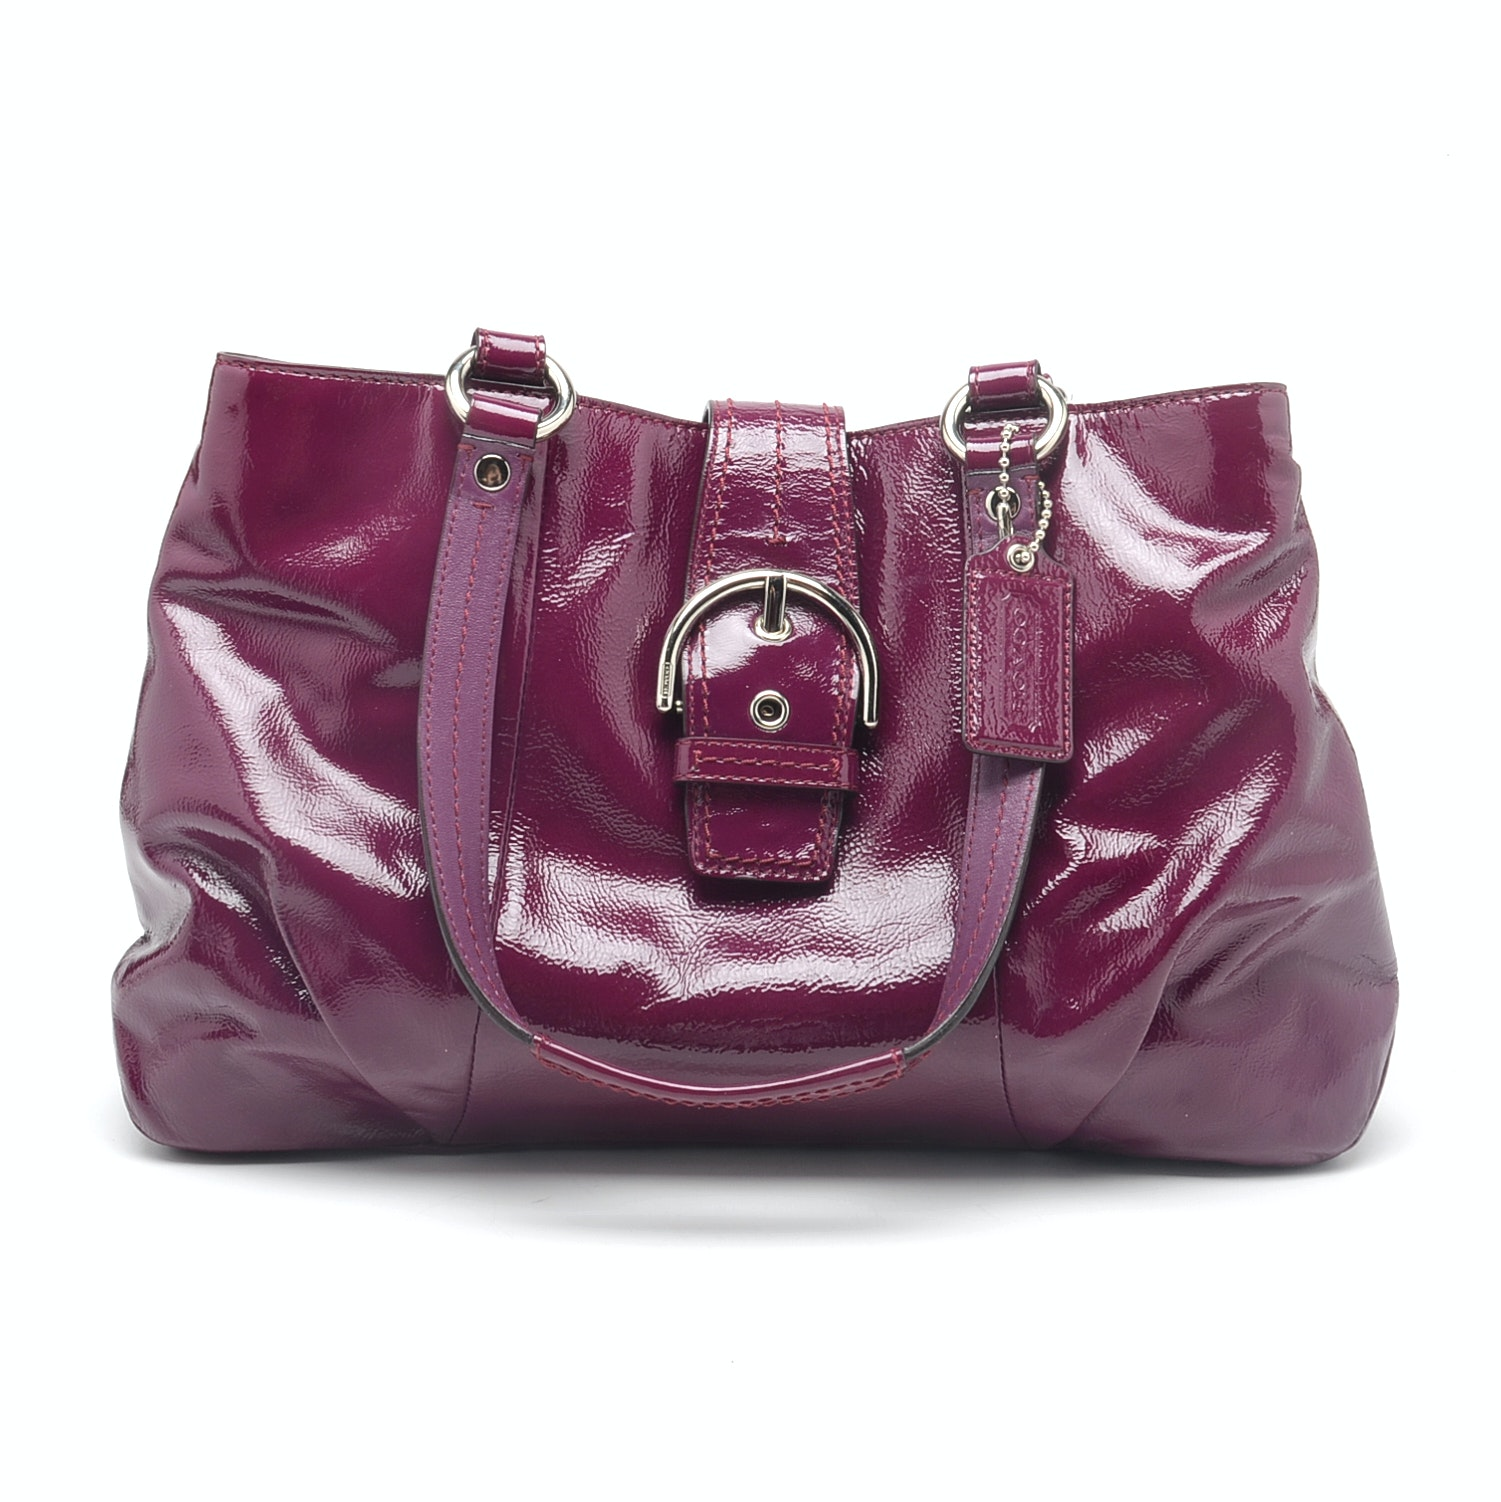 Coach Soho Plum Patent Leather Handbag